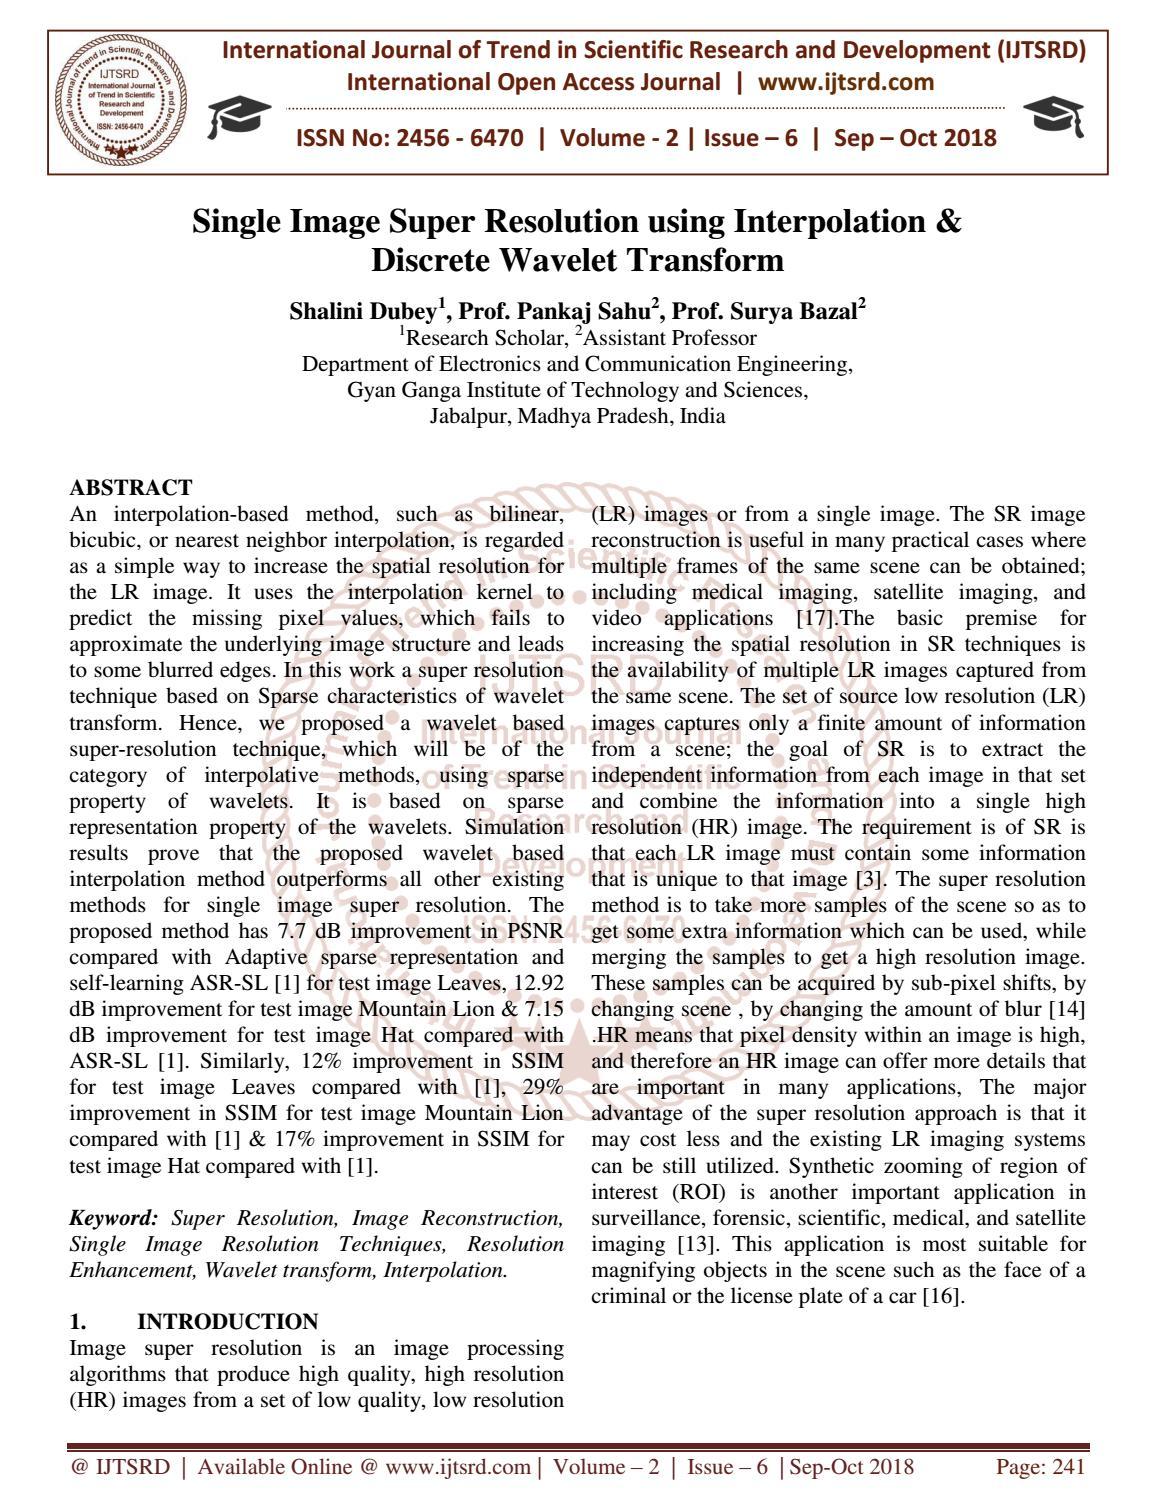 Single Image Super Resolution using Interpolation and Discrete